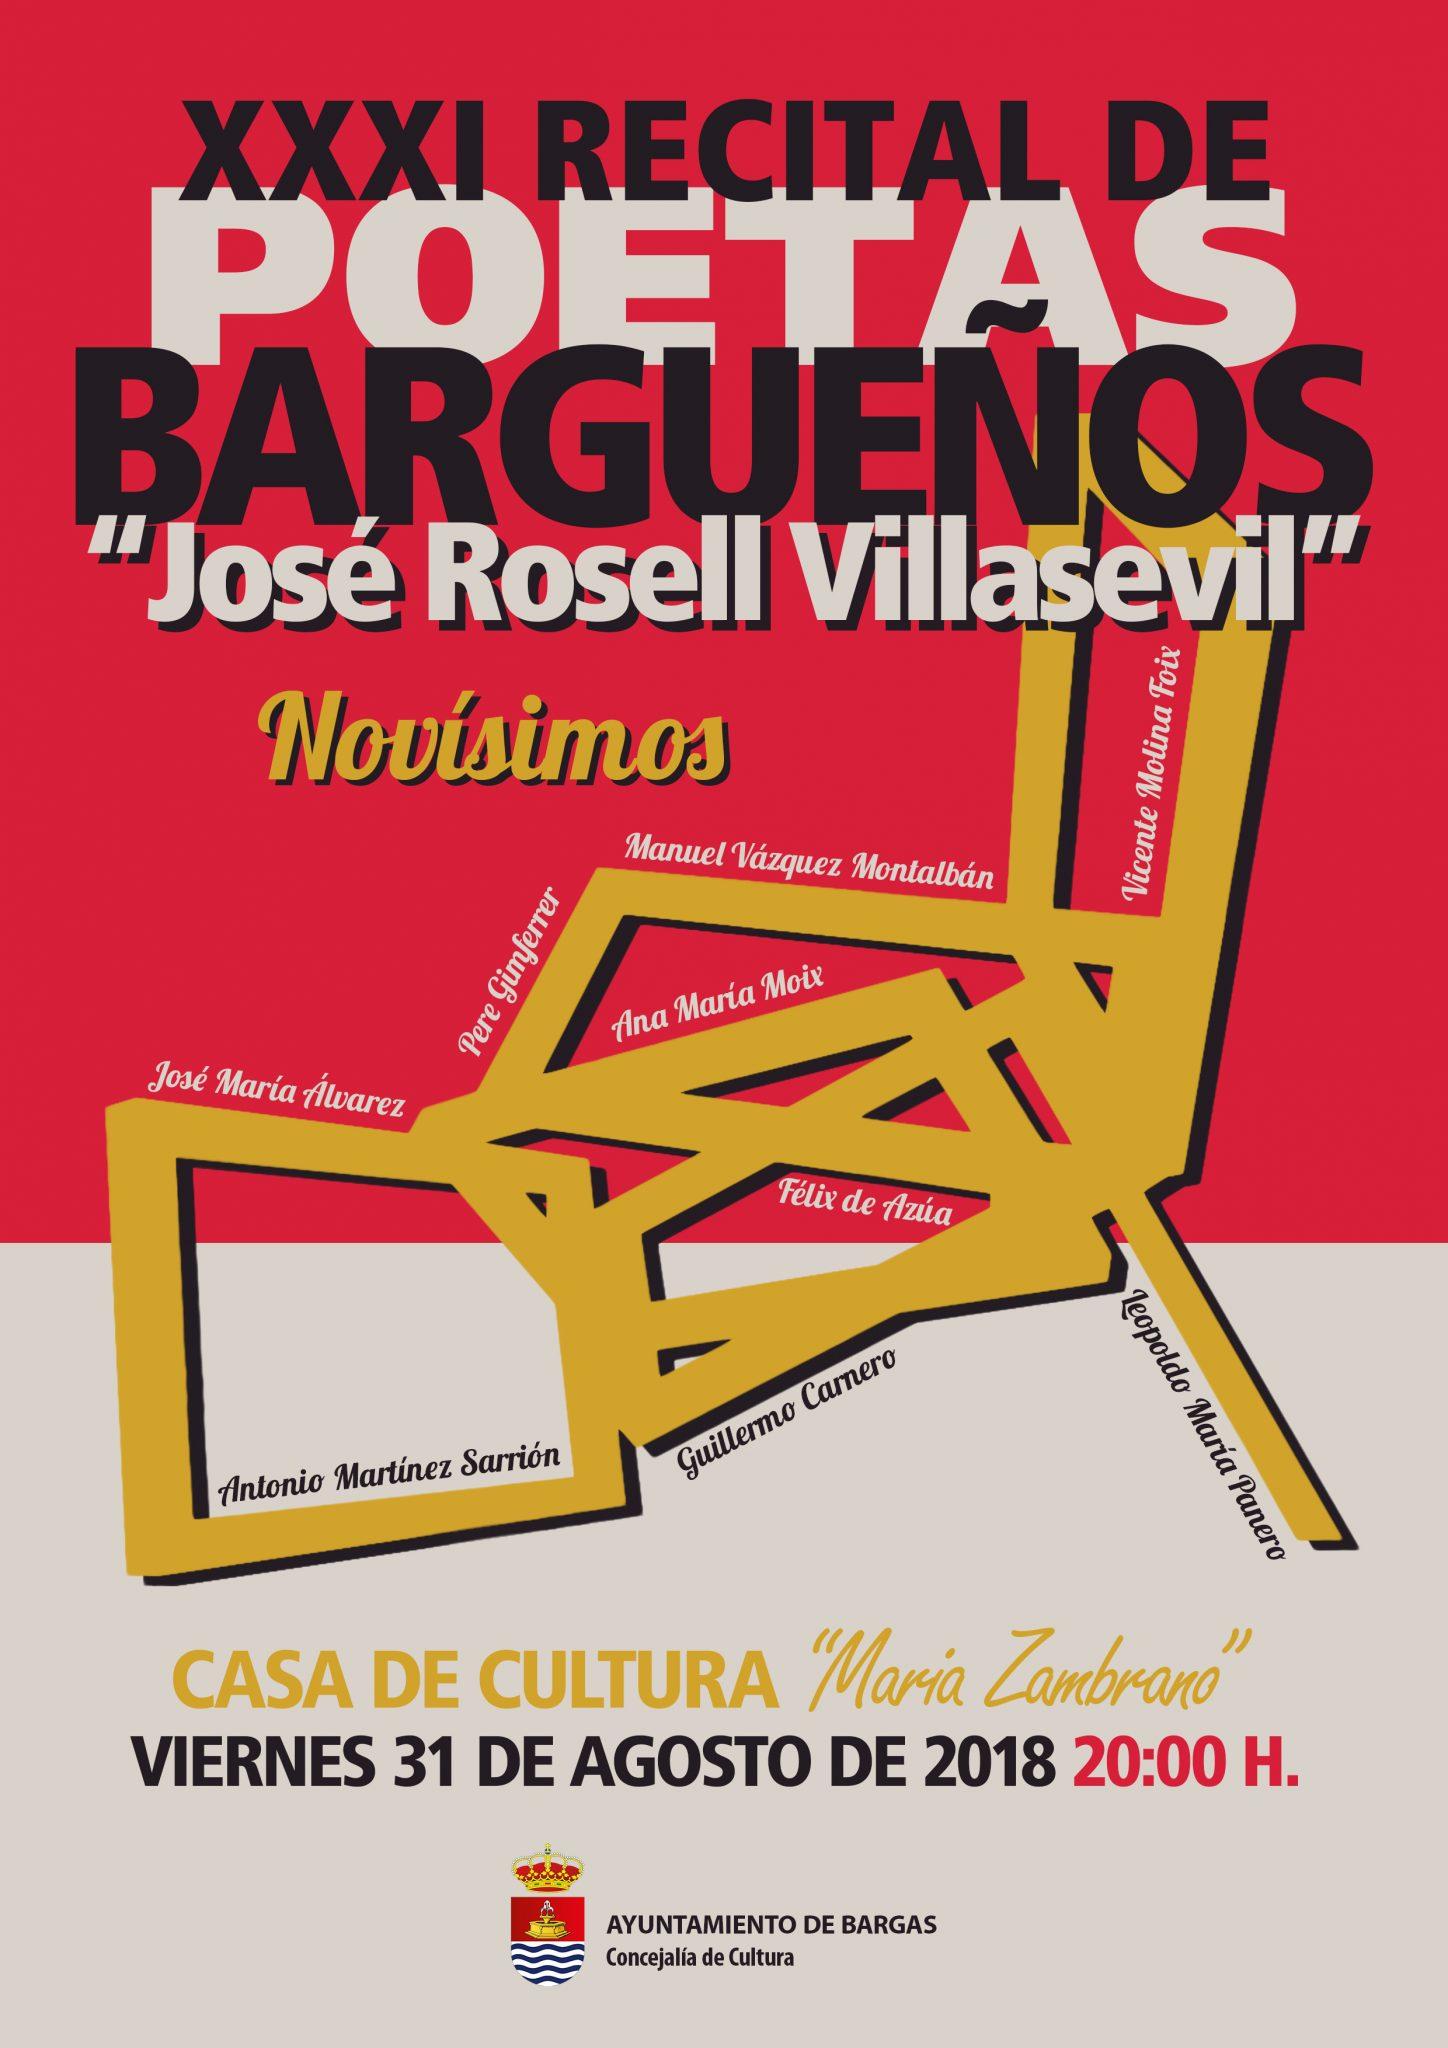 XXXI Recital de Poetas Bargueños